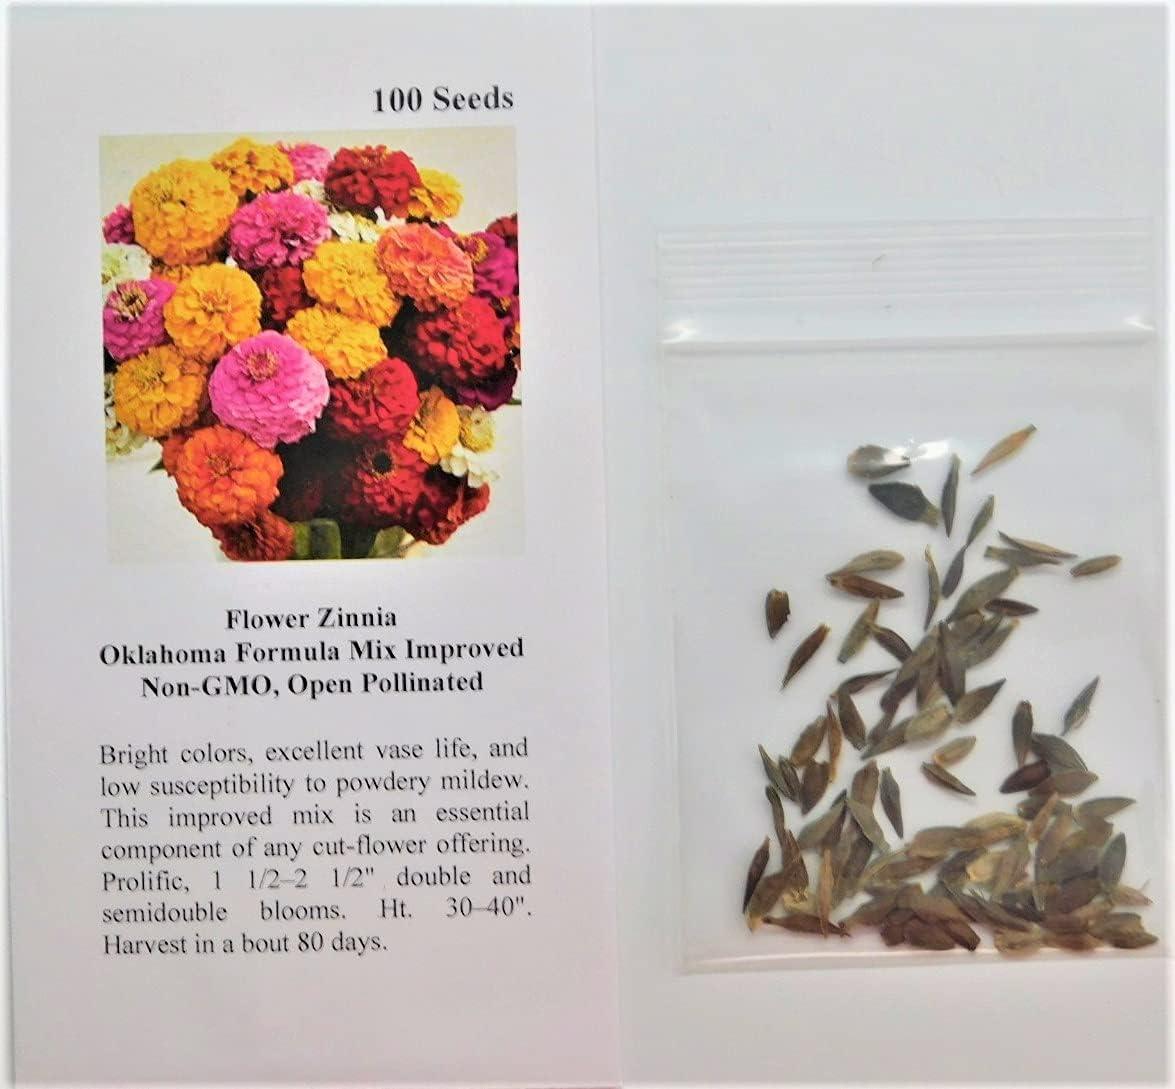 David's Garden Seeds Flower Zinnia Oklahoma Formula Mix Improved 1148 (Multi) 100 Non-GMO, Open Pollinated Seeds